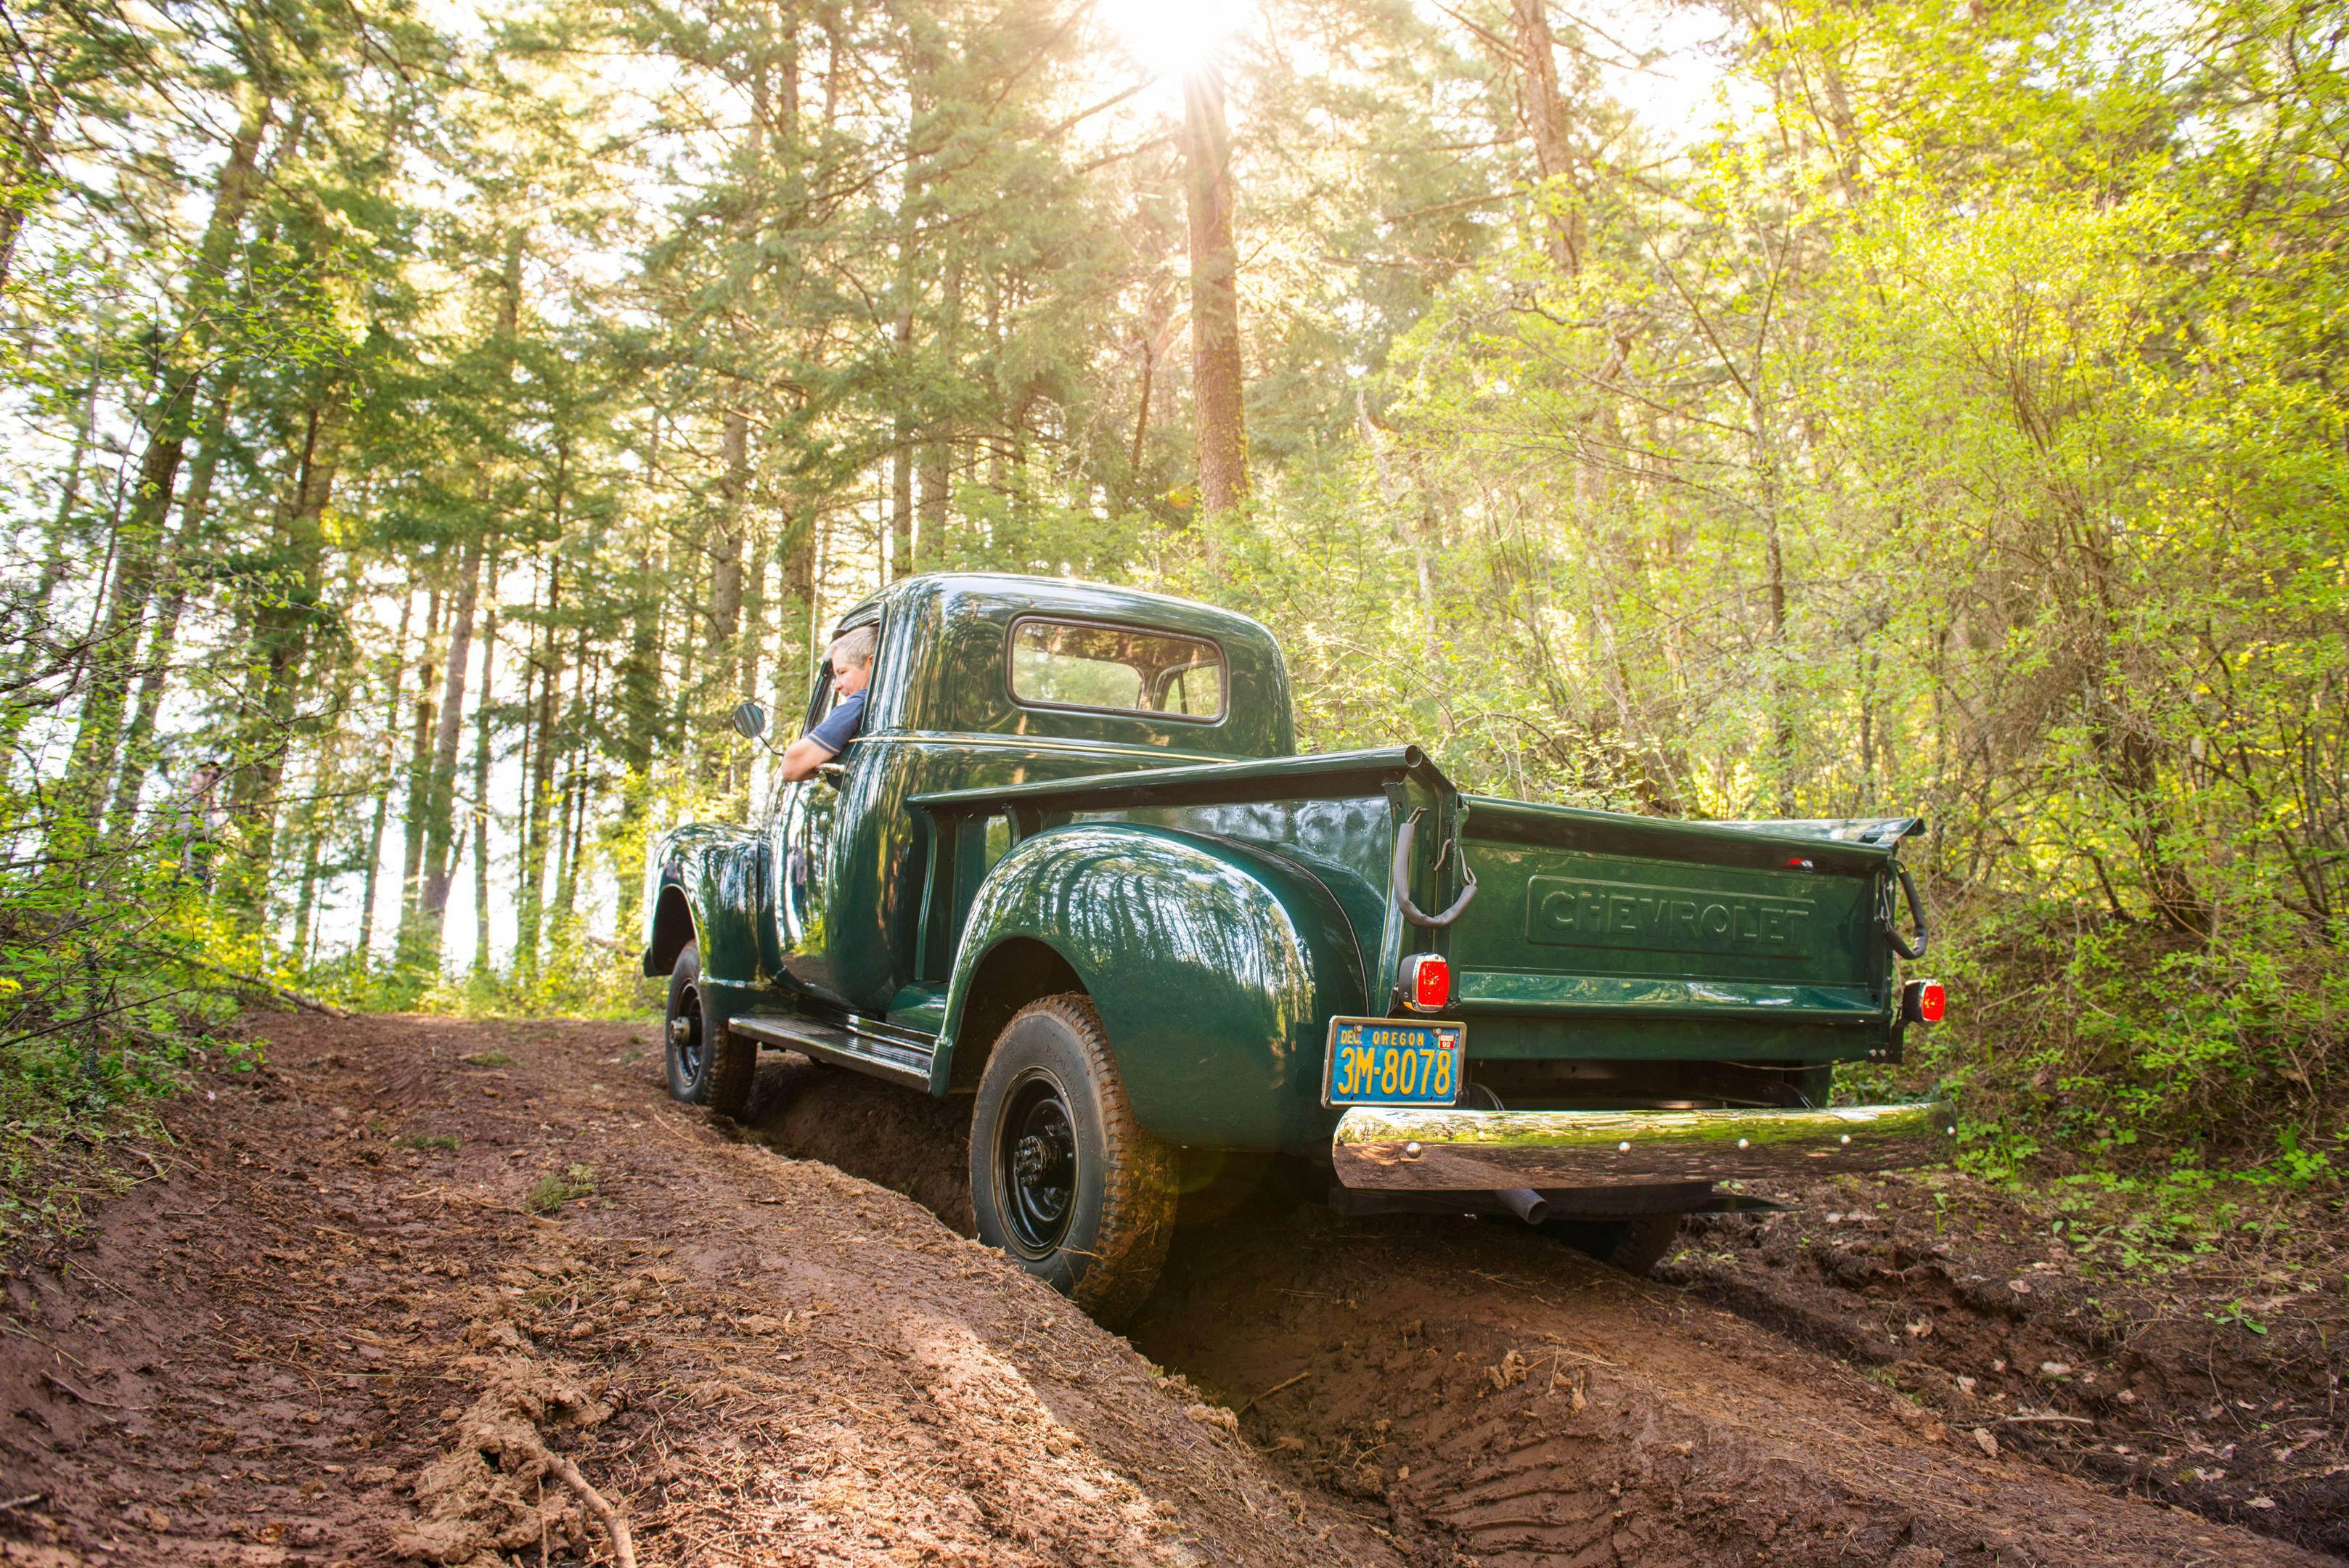 Chevy 4x4 truck rear